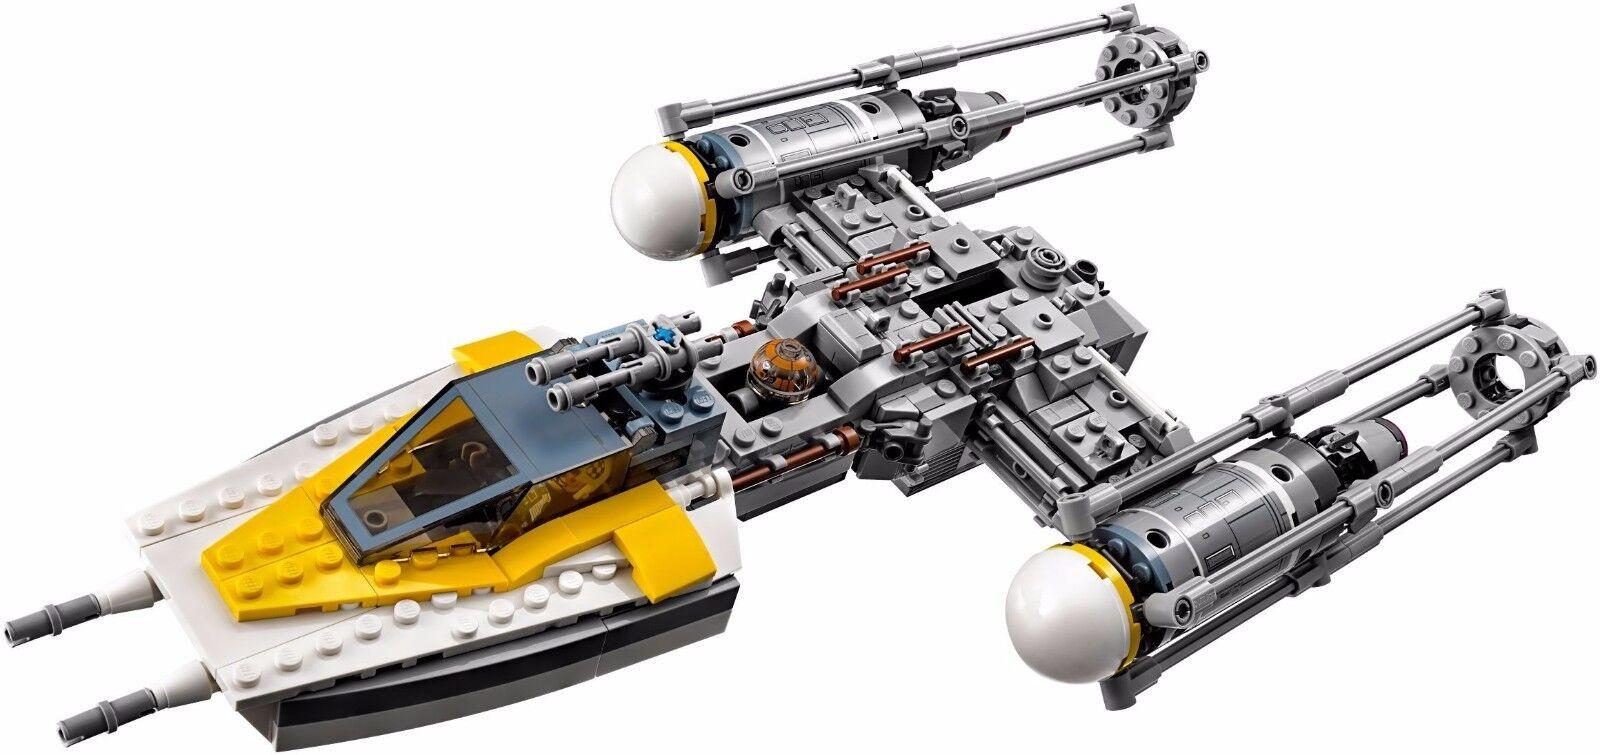 LEGO  75172 Y-Wing estrellacombatiente™ - estrella guerras 8-14anni  prezzo all'ingrosso